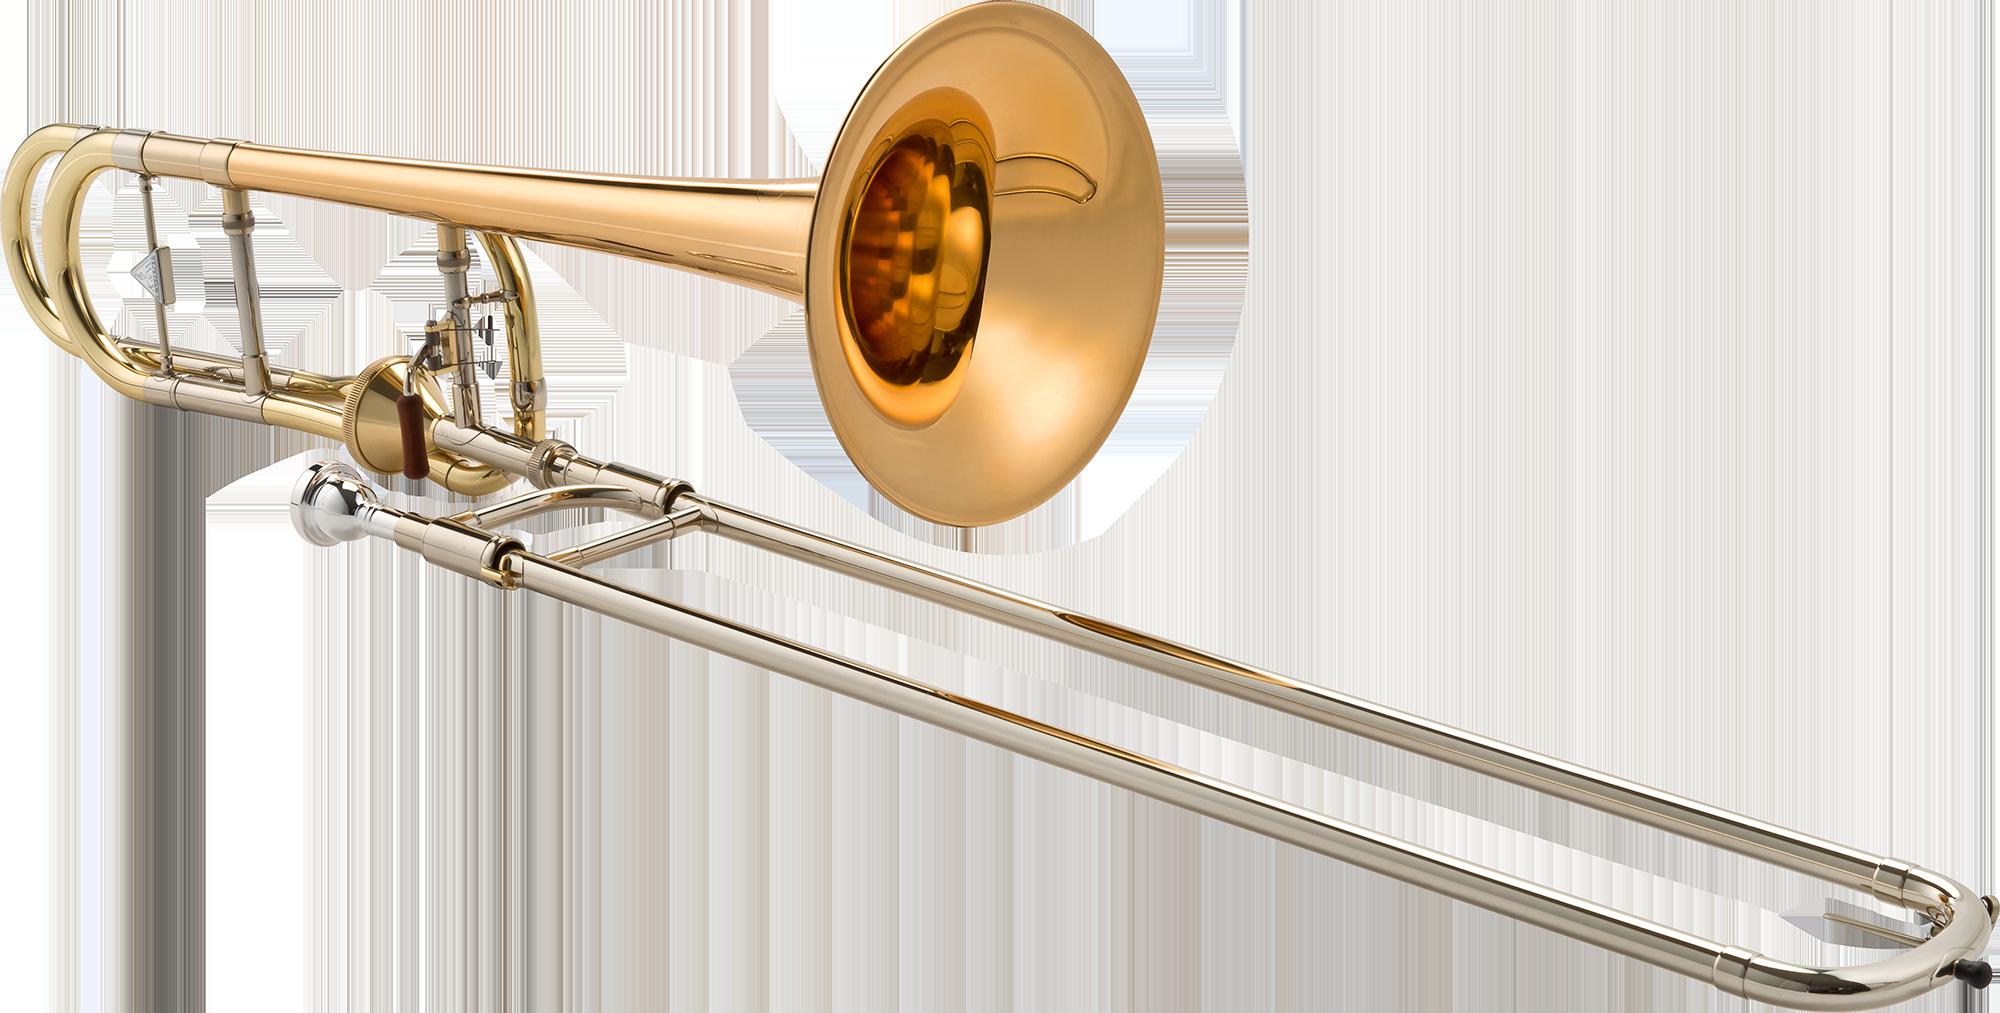 76 trombones clipart image library download Trombone PNG images free download image library download